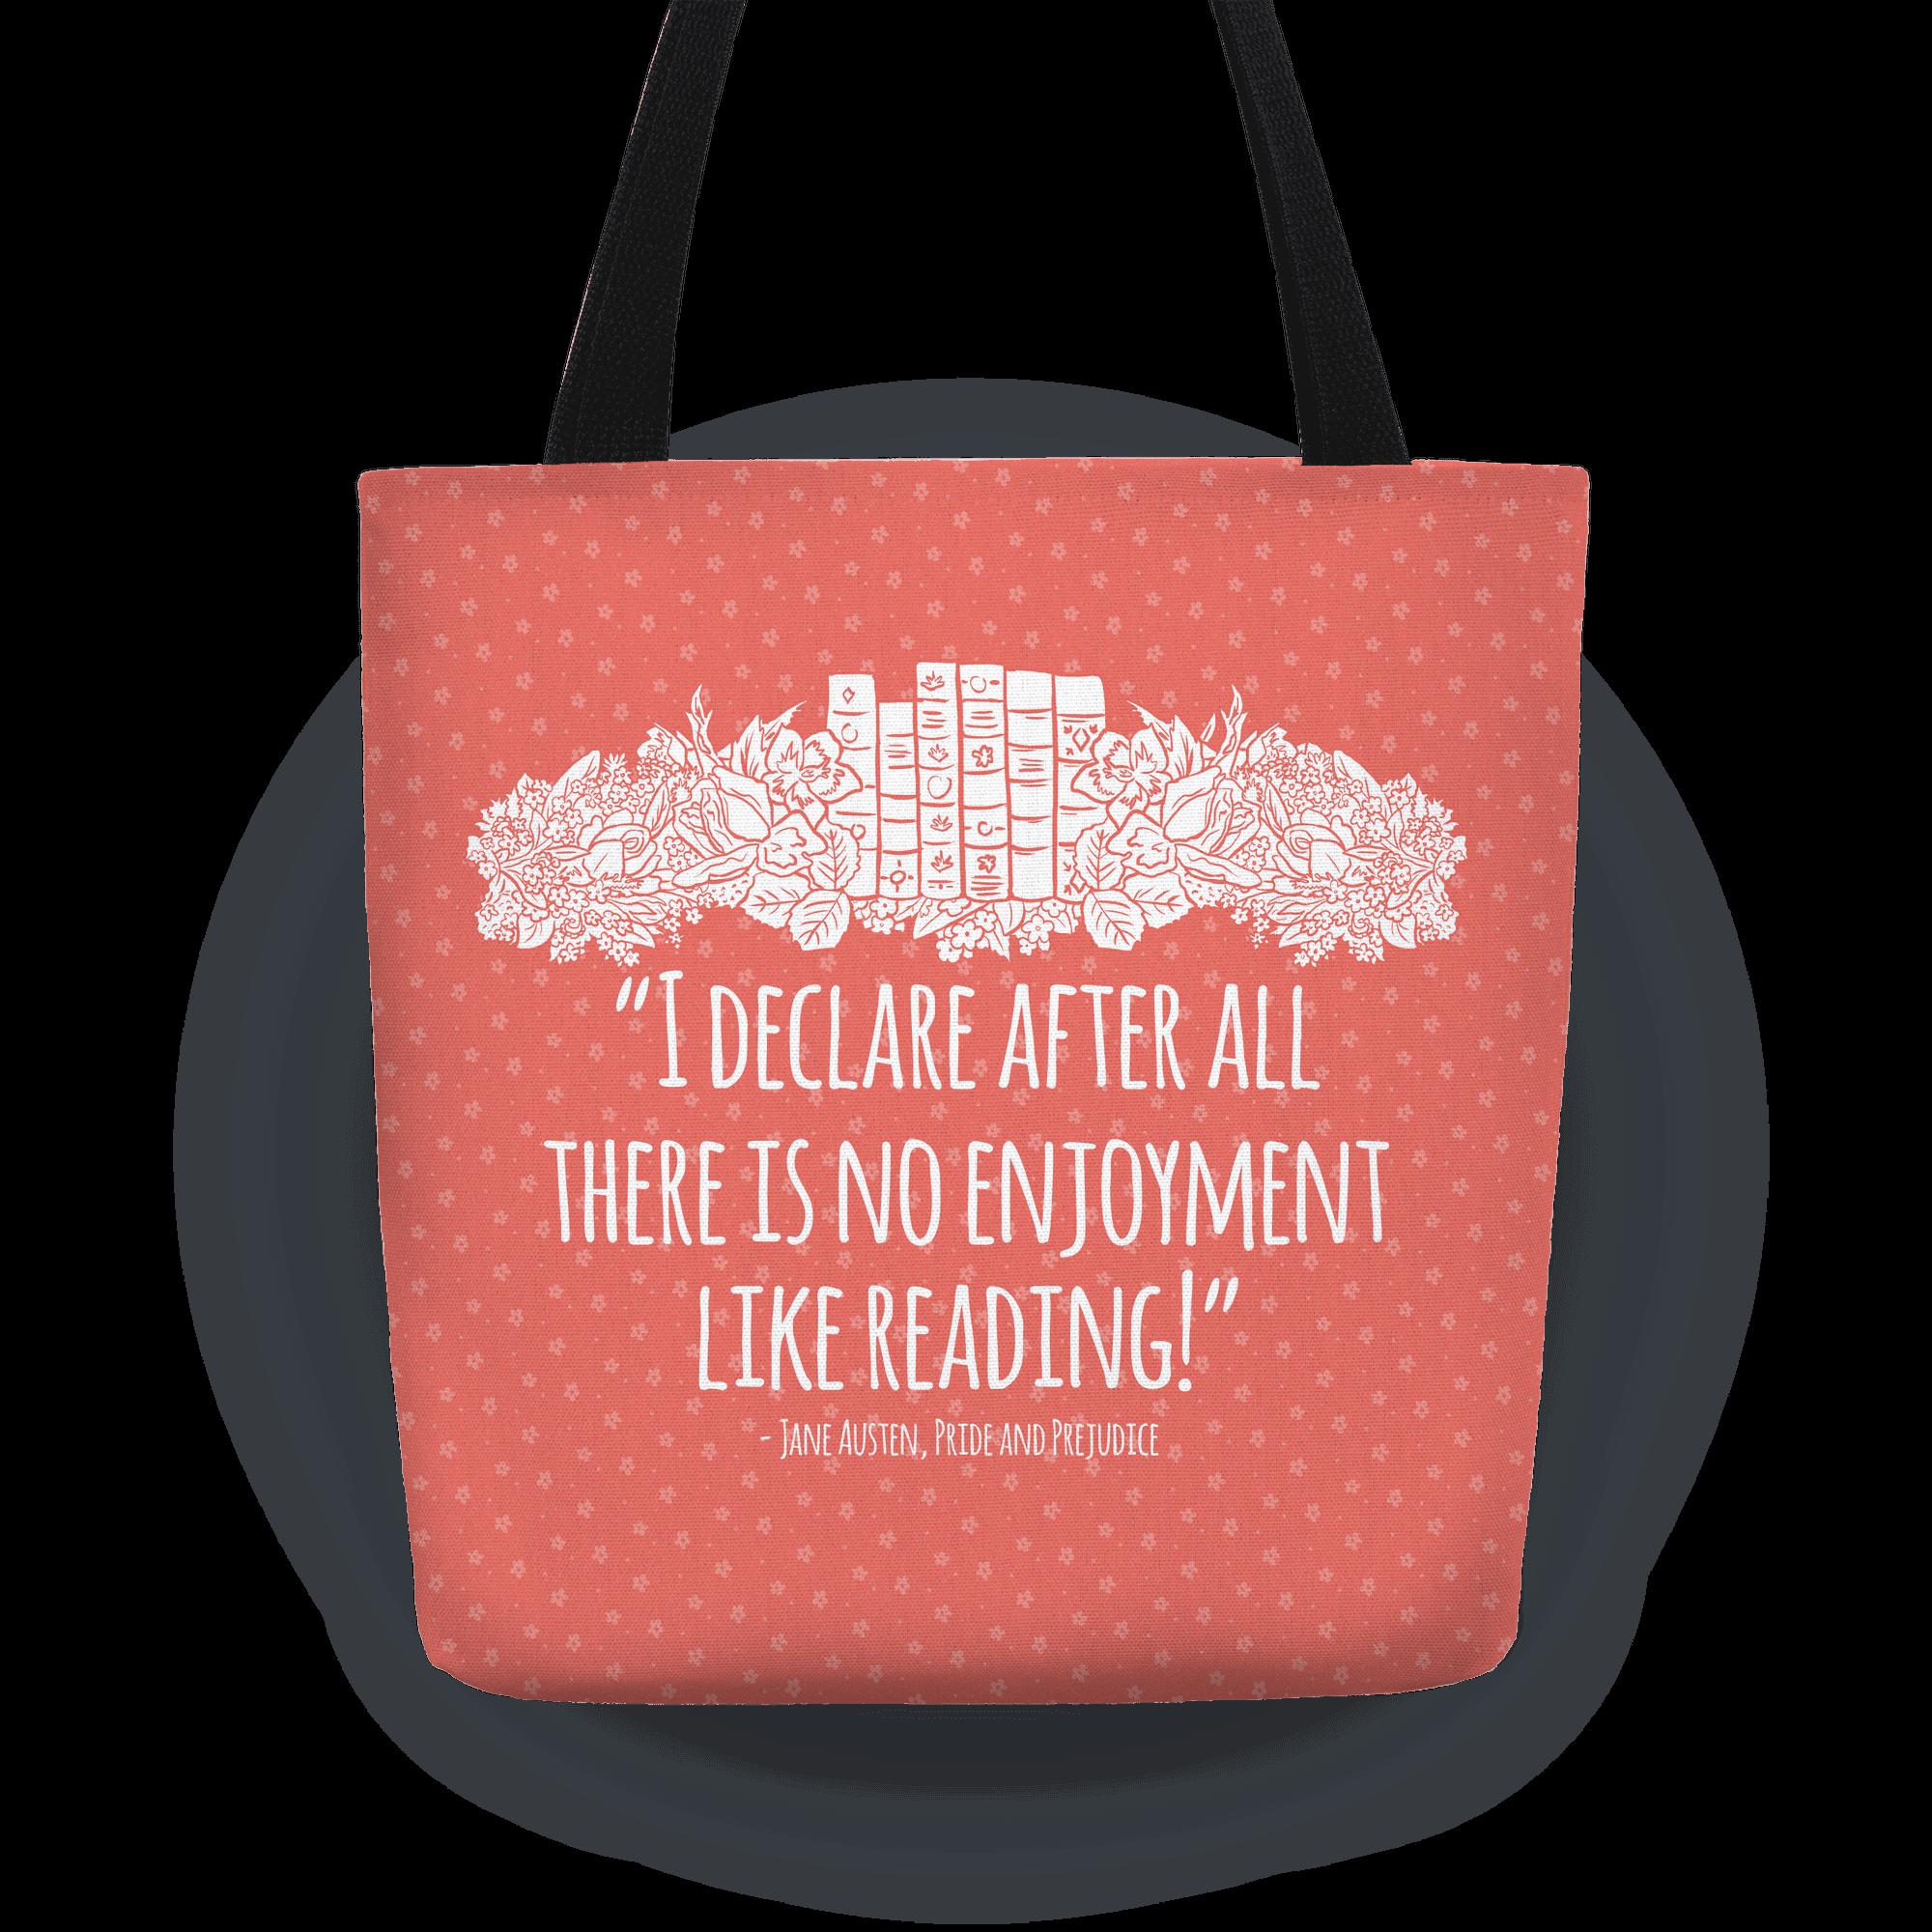 canvas handbag tote Jane Austen Tote Bag everyday large bag literary tote library quote grocery bag canvas Pride /& Prejudice shopper bag